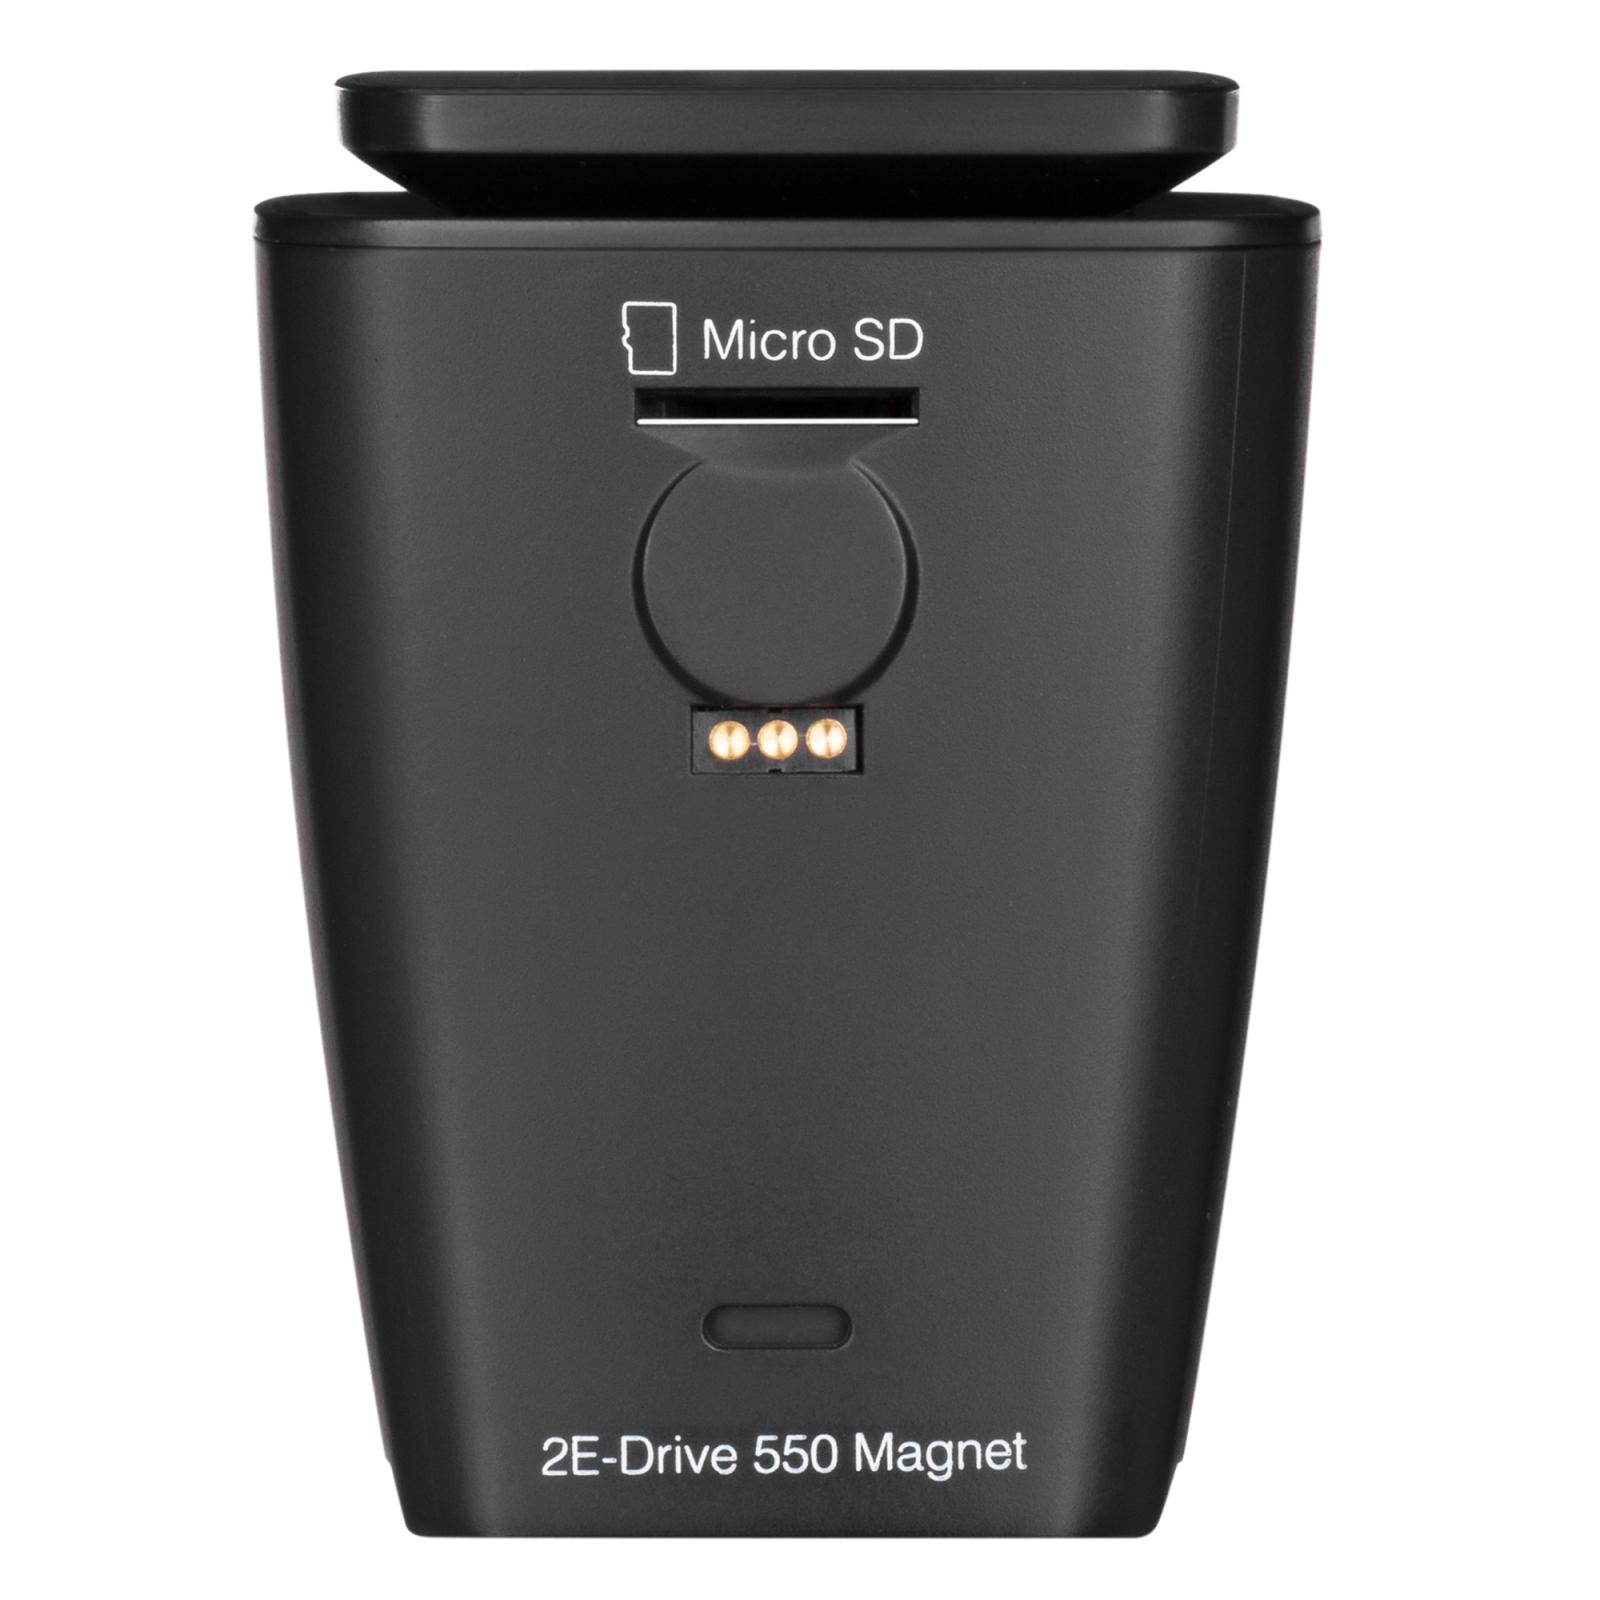 Відеореєстратор 2E Drive 550 Magnet (2E-DRIVE550MAGNET) зображення 7